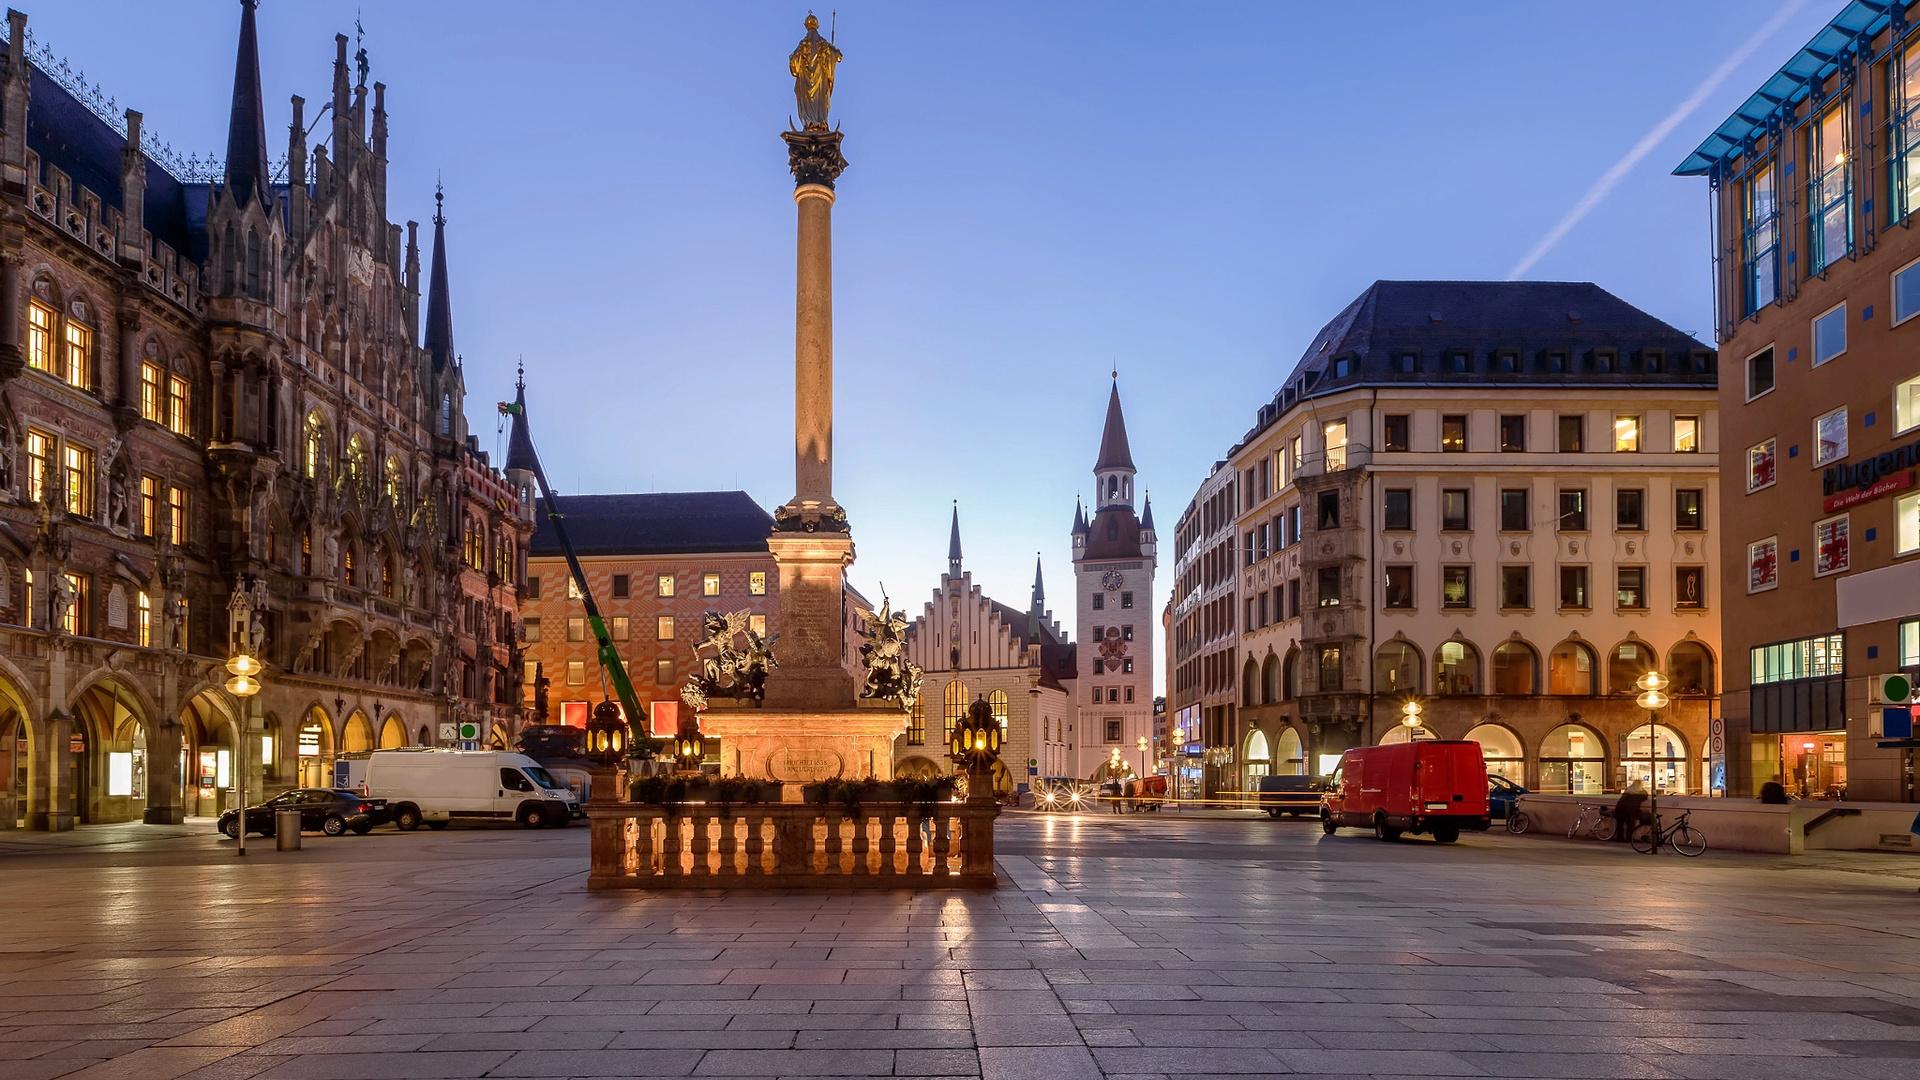 marienplatz, munich, bavaria, germany, бавария, германия, город, мюнхен, площадь, мариенплац, здания, дома, ратуша, утро